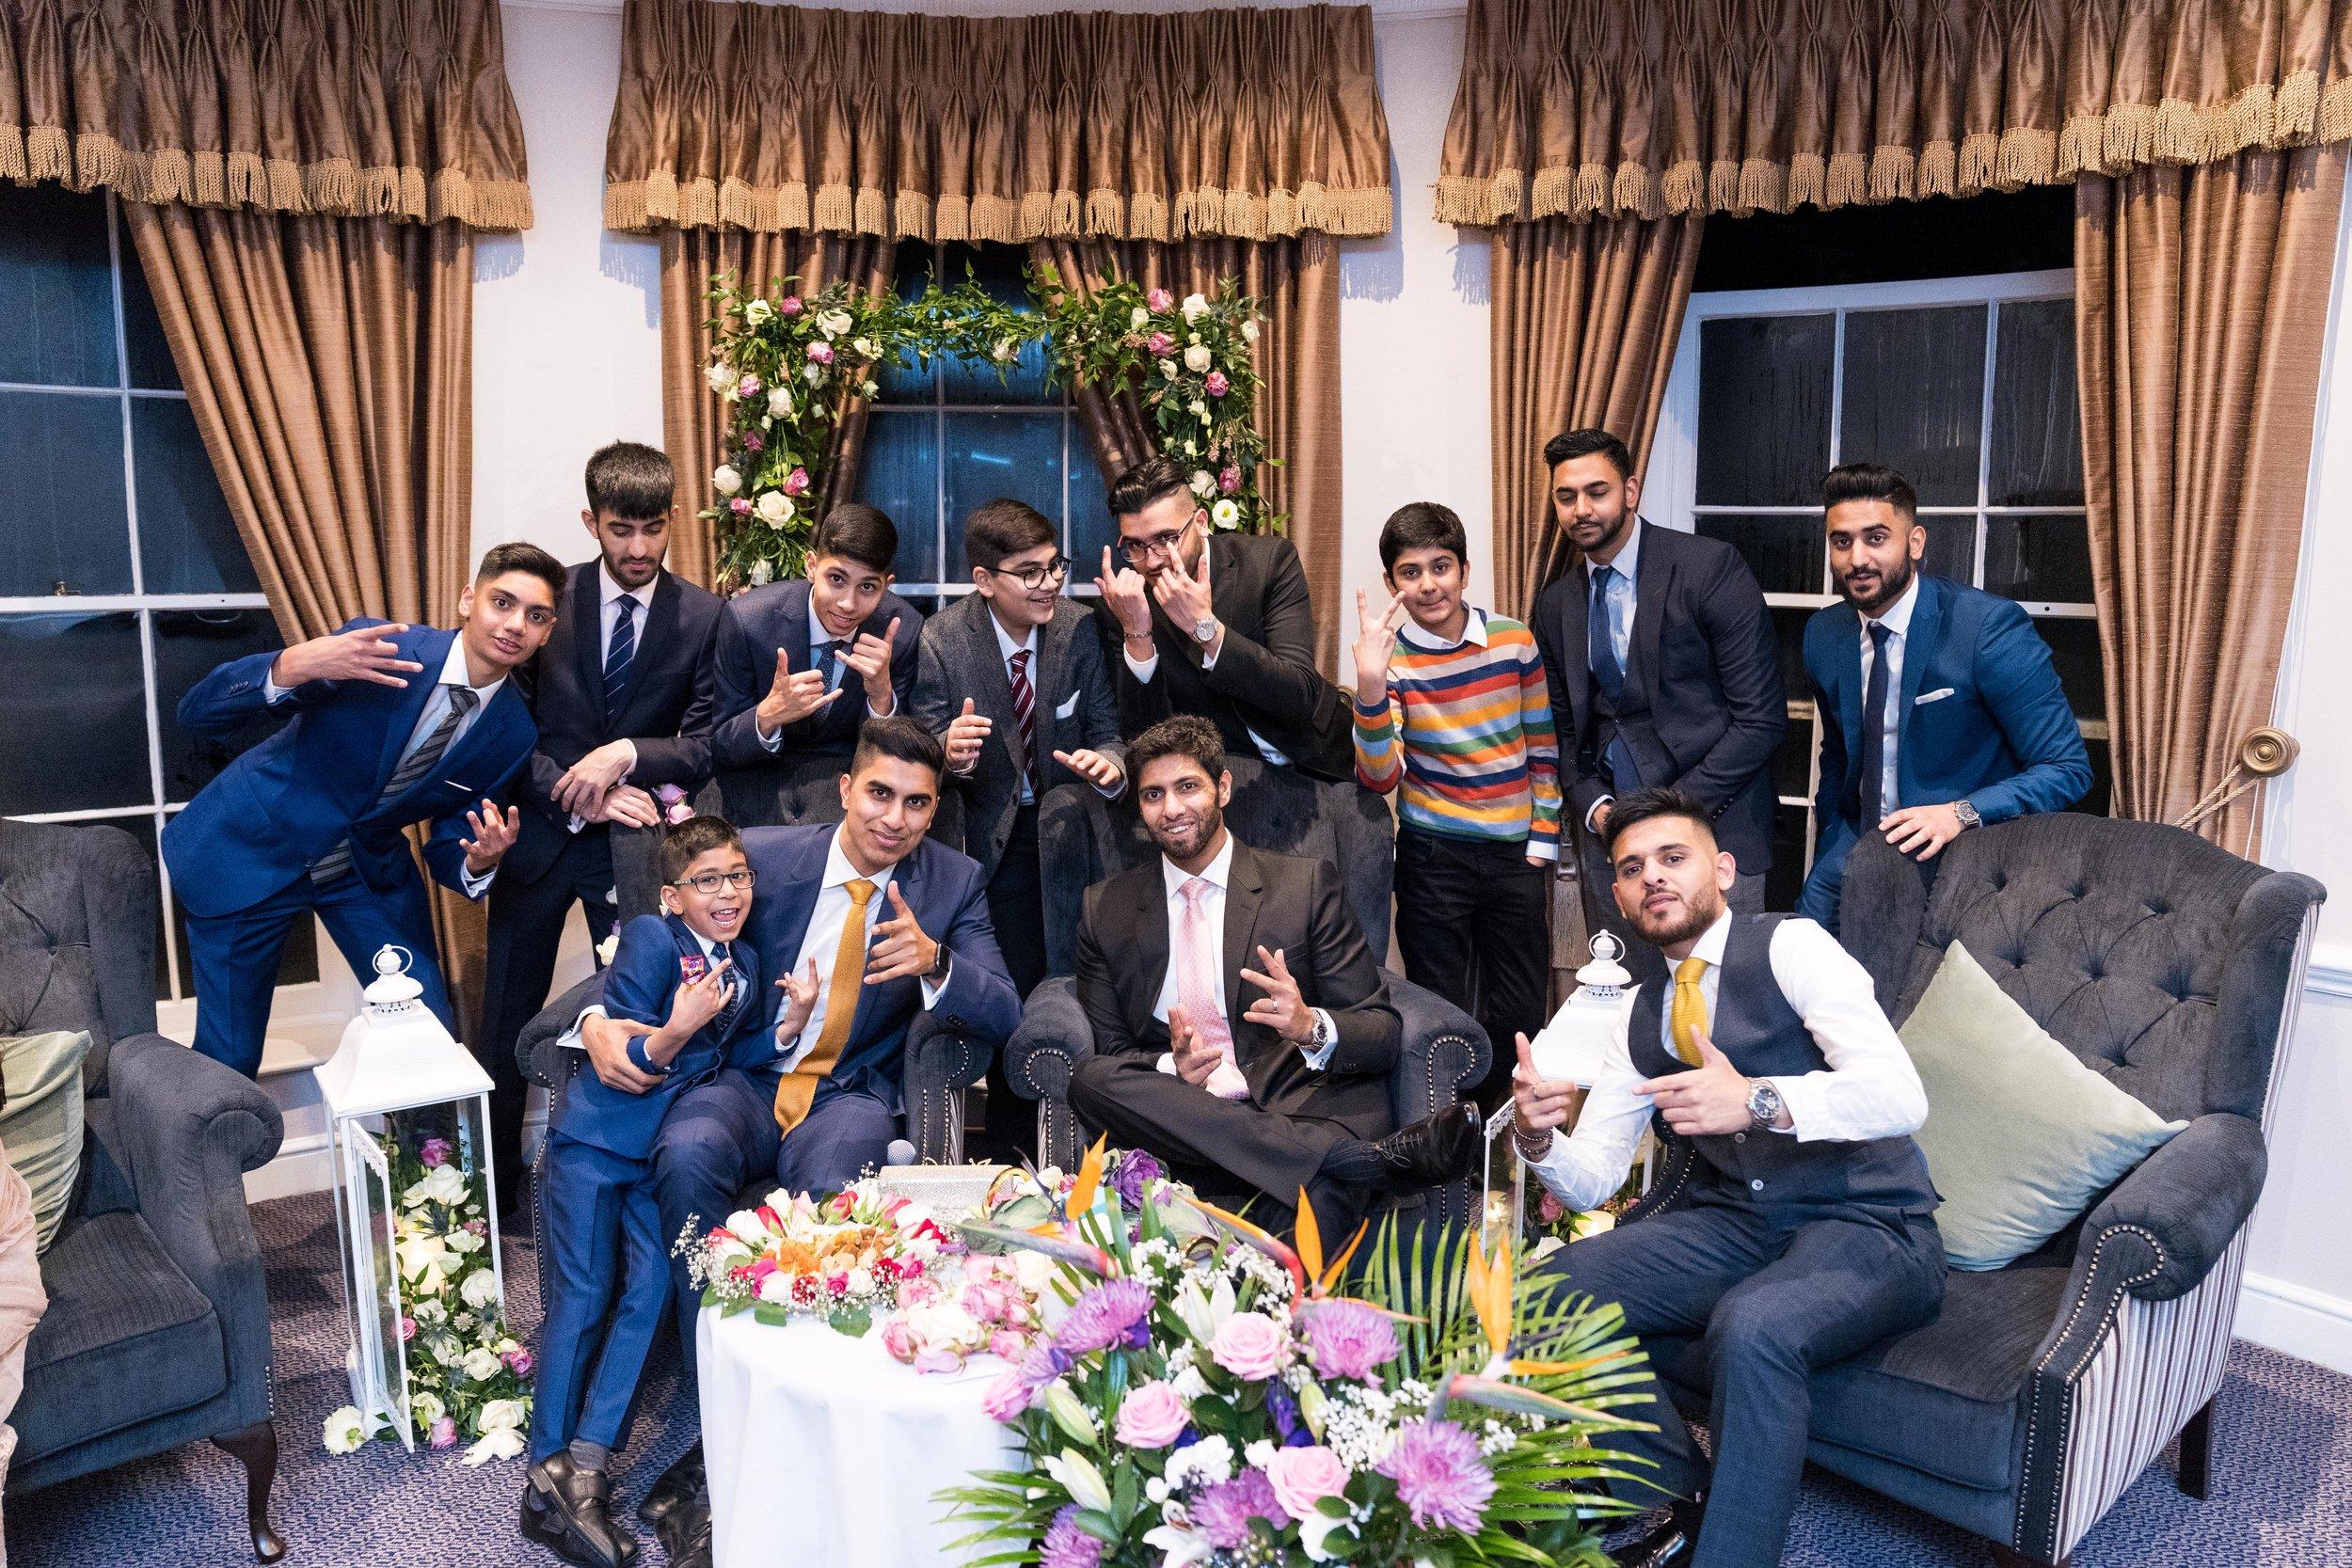 buckinghamshire-golf-club-winter-muslim-wedding-engagement-photography-videography-65